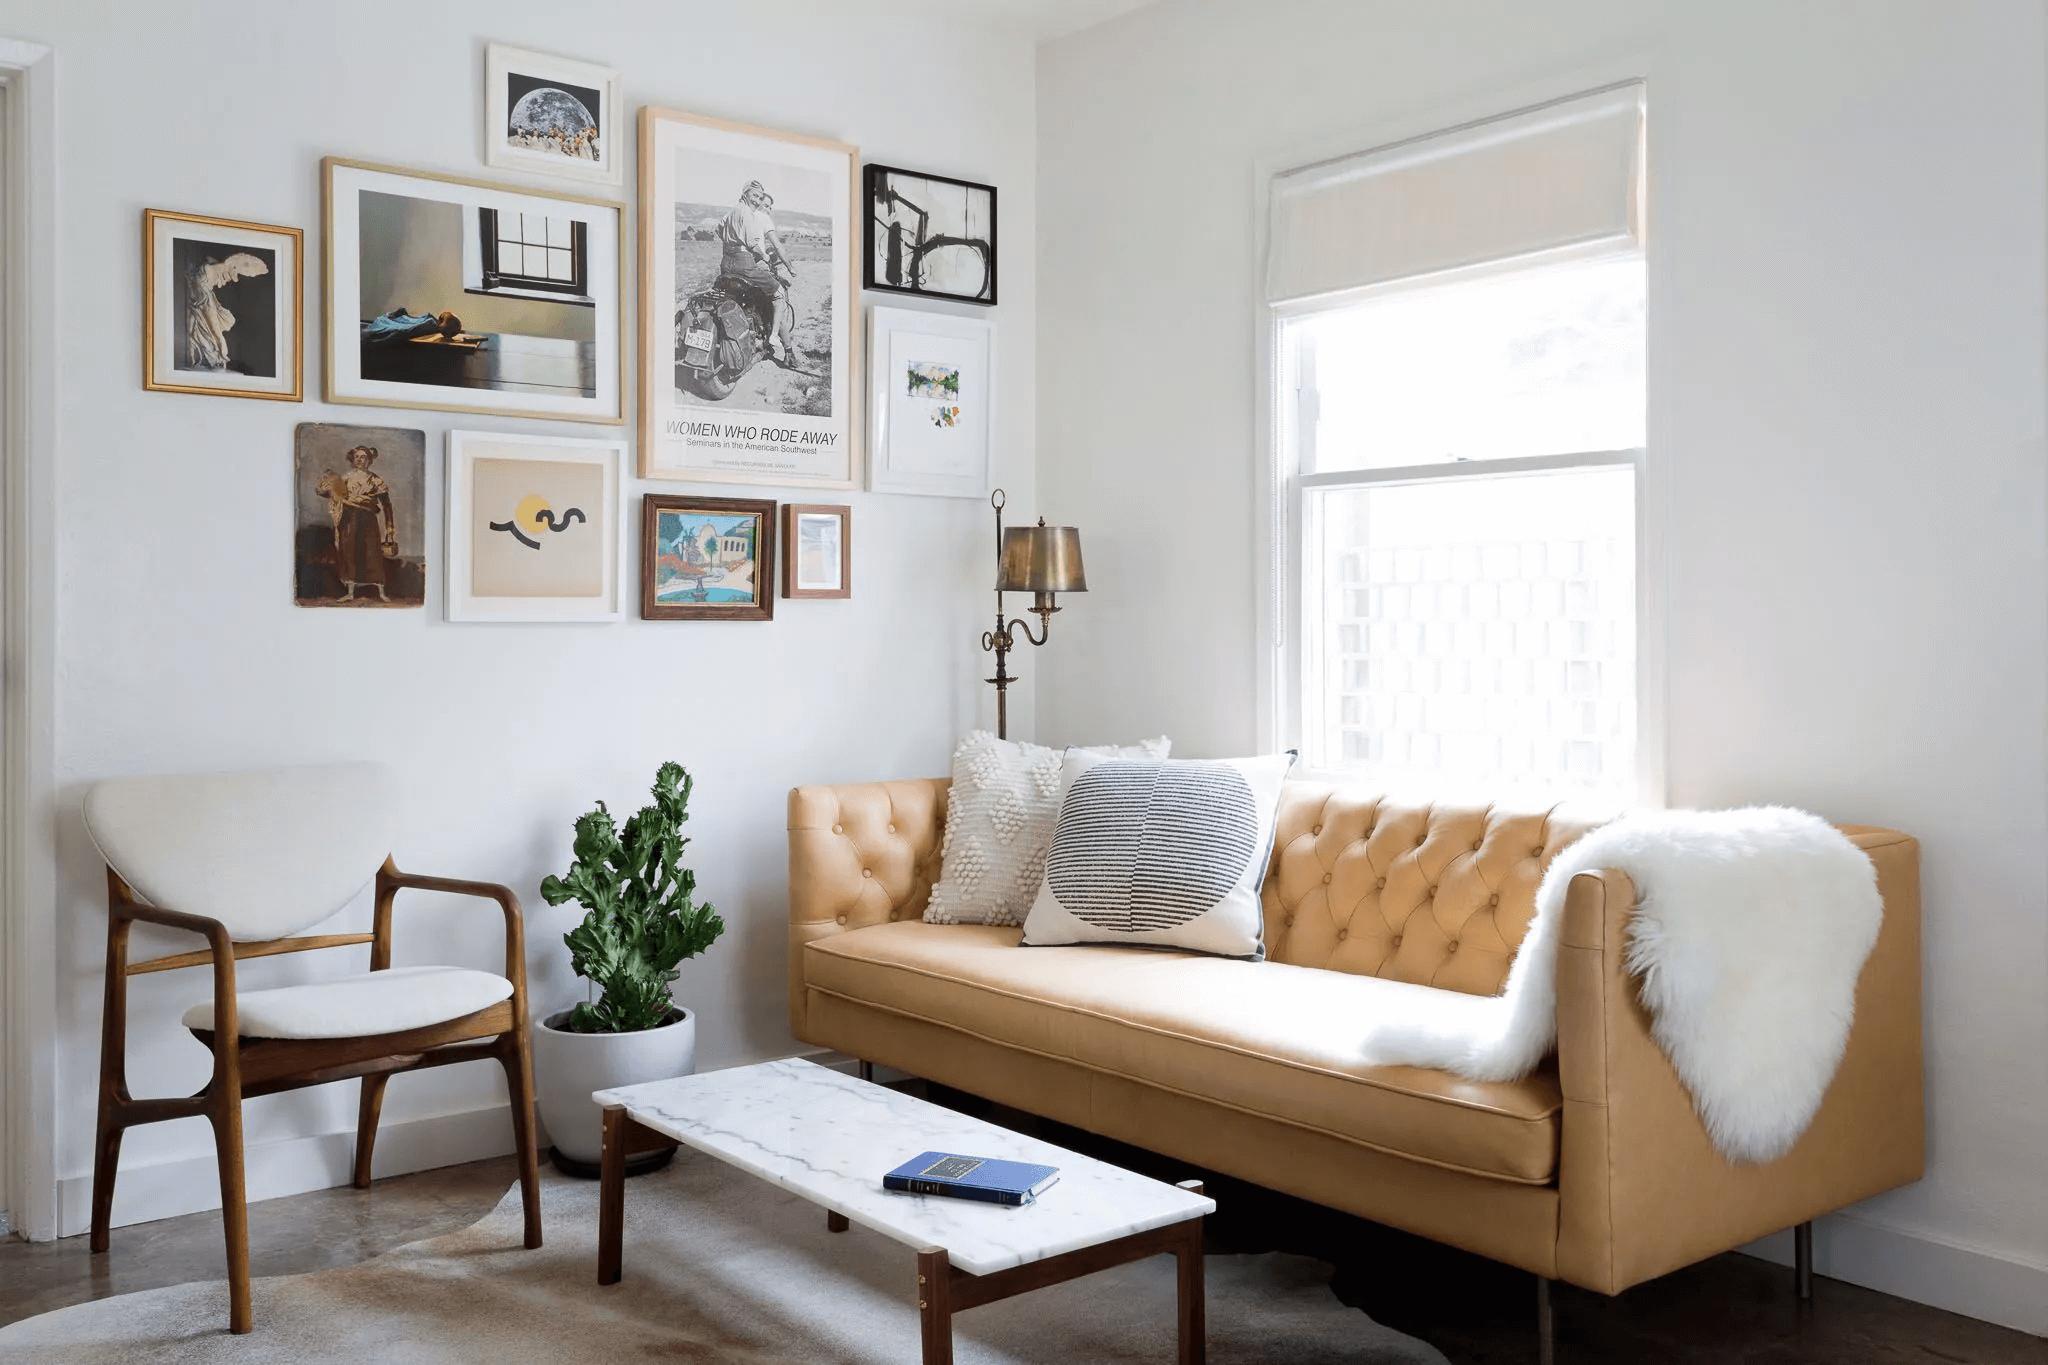 Comment transformer un coin bizarre en un petit salon invitant